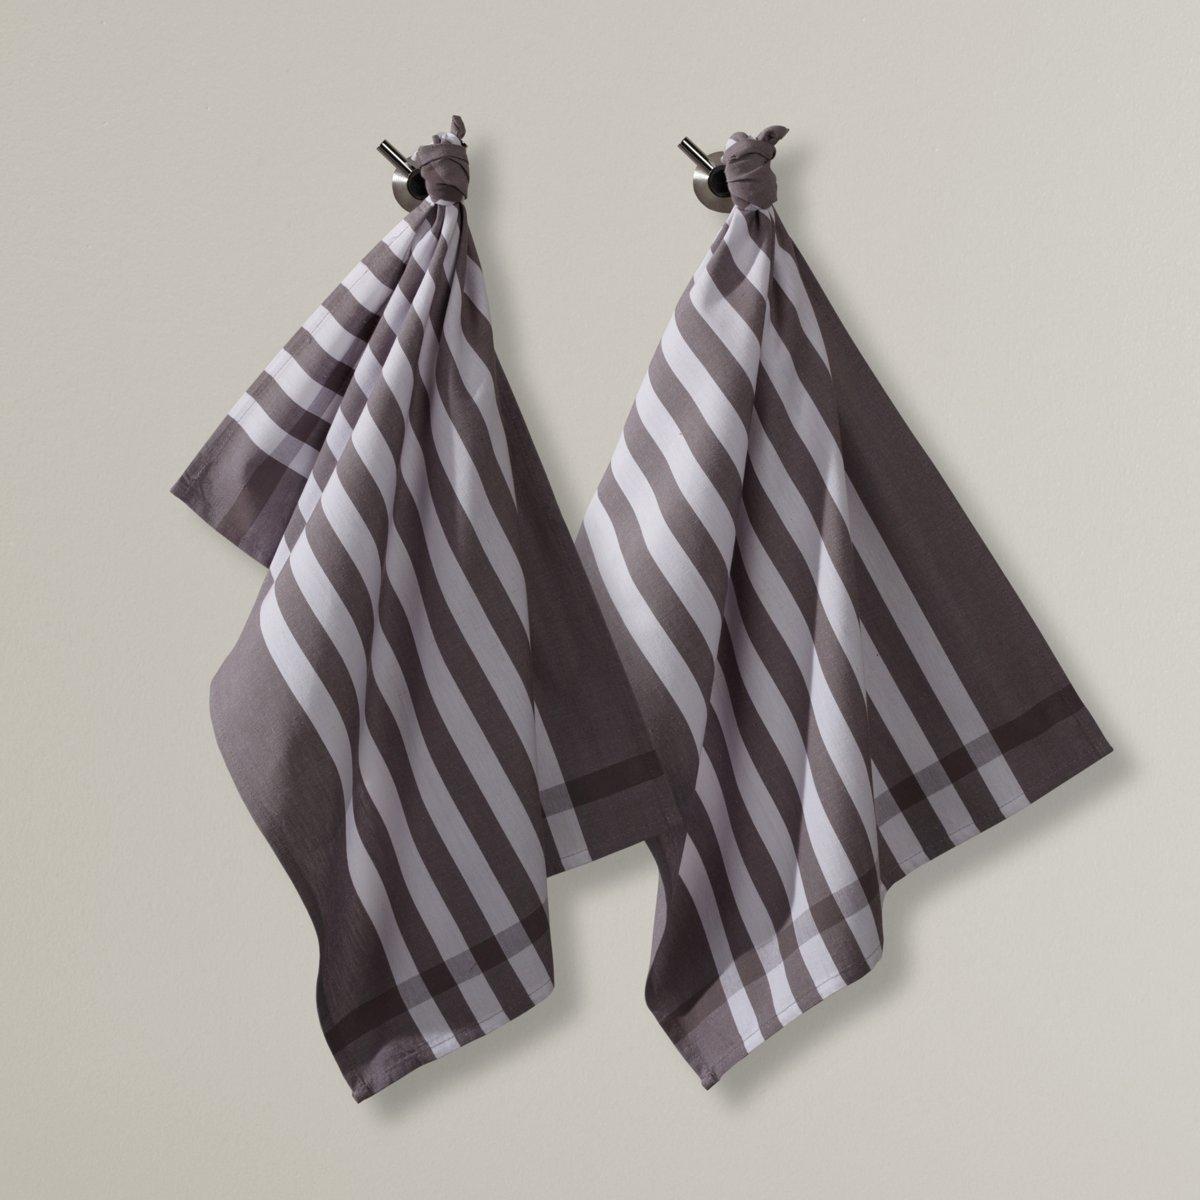 2 полотенца кухонных полотенца кухонные la pastel комплект кухонных полотенец gabel 6пр 50x70 primizie